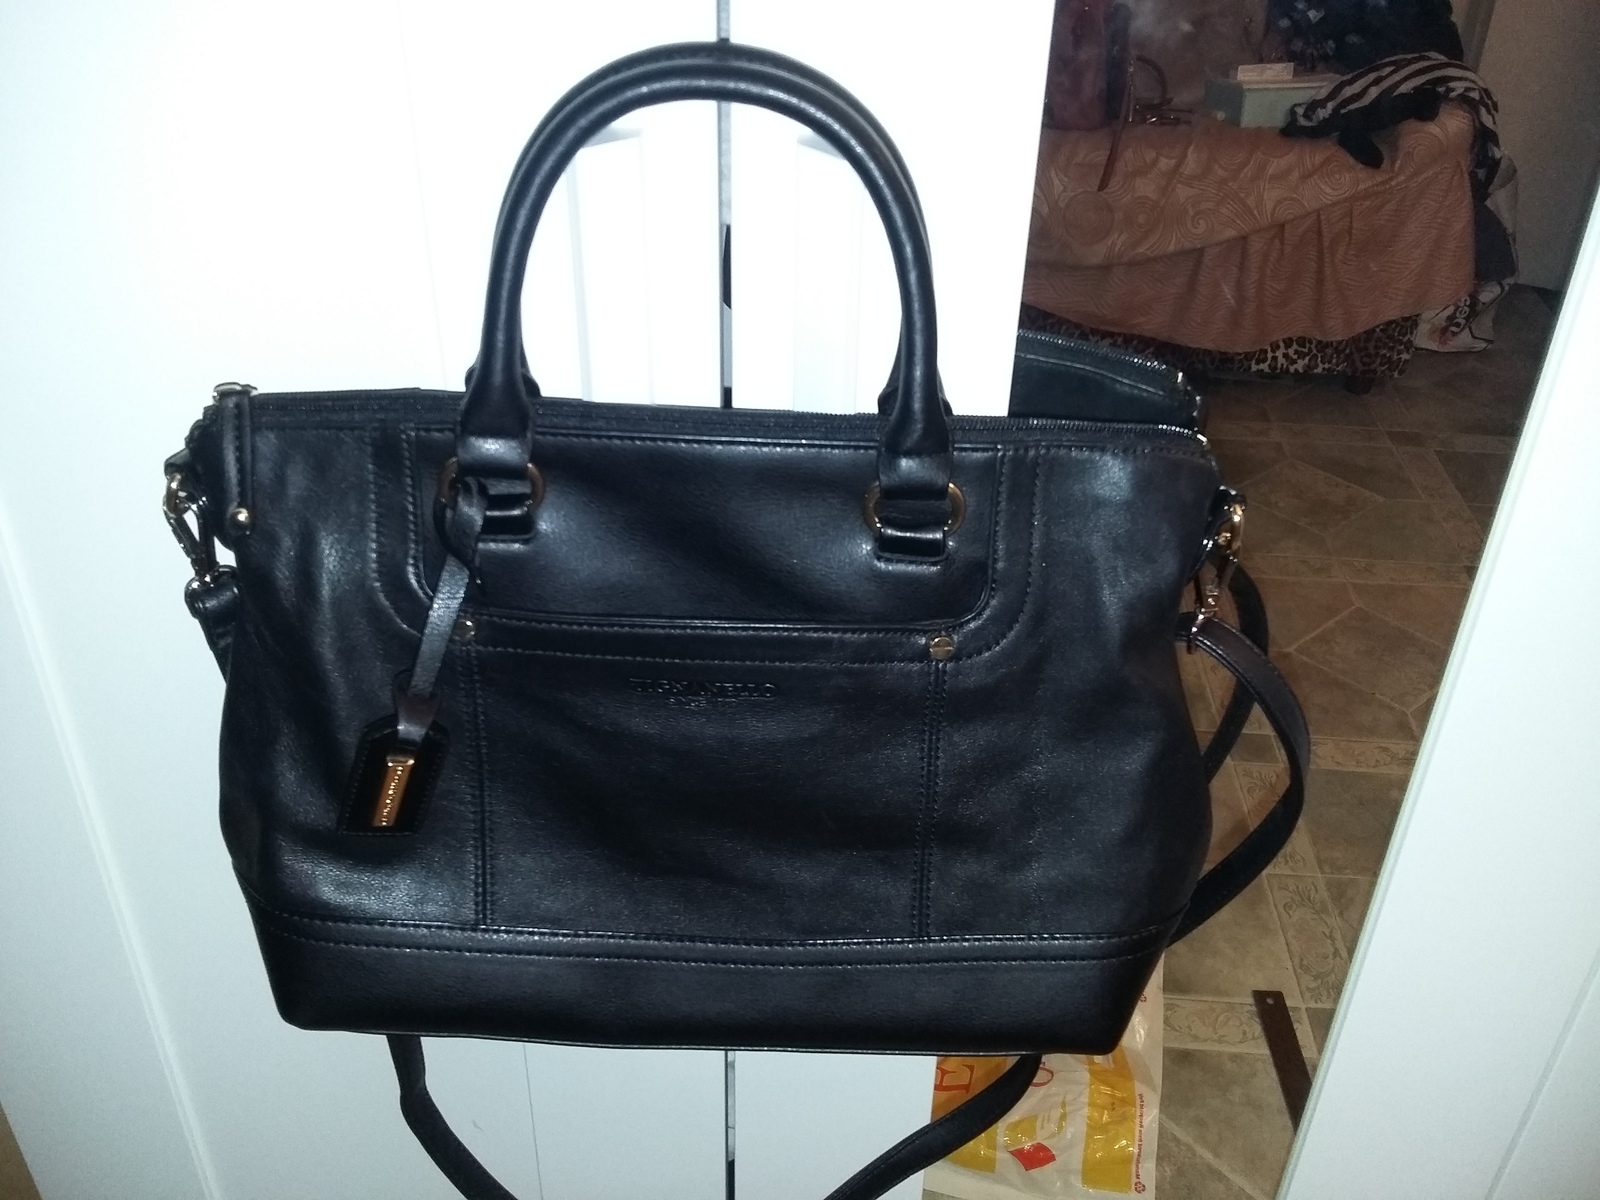 f1eda8ba40 20160206 232856. 20160206 232856. Previous. Beautiful Tignanello Smooth  Operator Convertible Satchel Top Handle Leather Bag